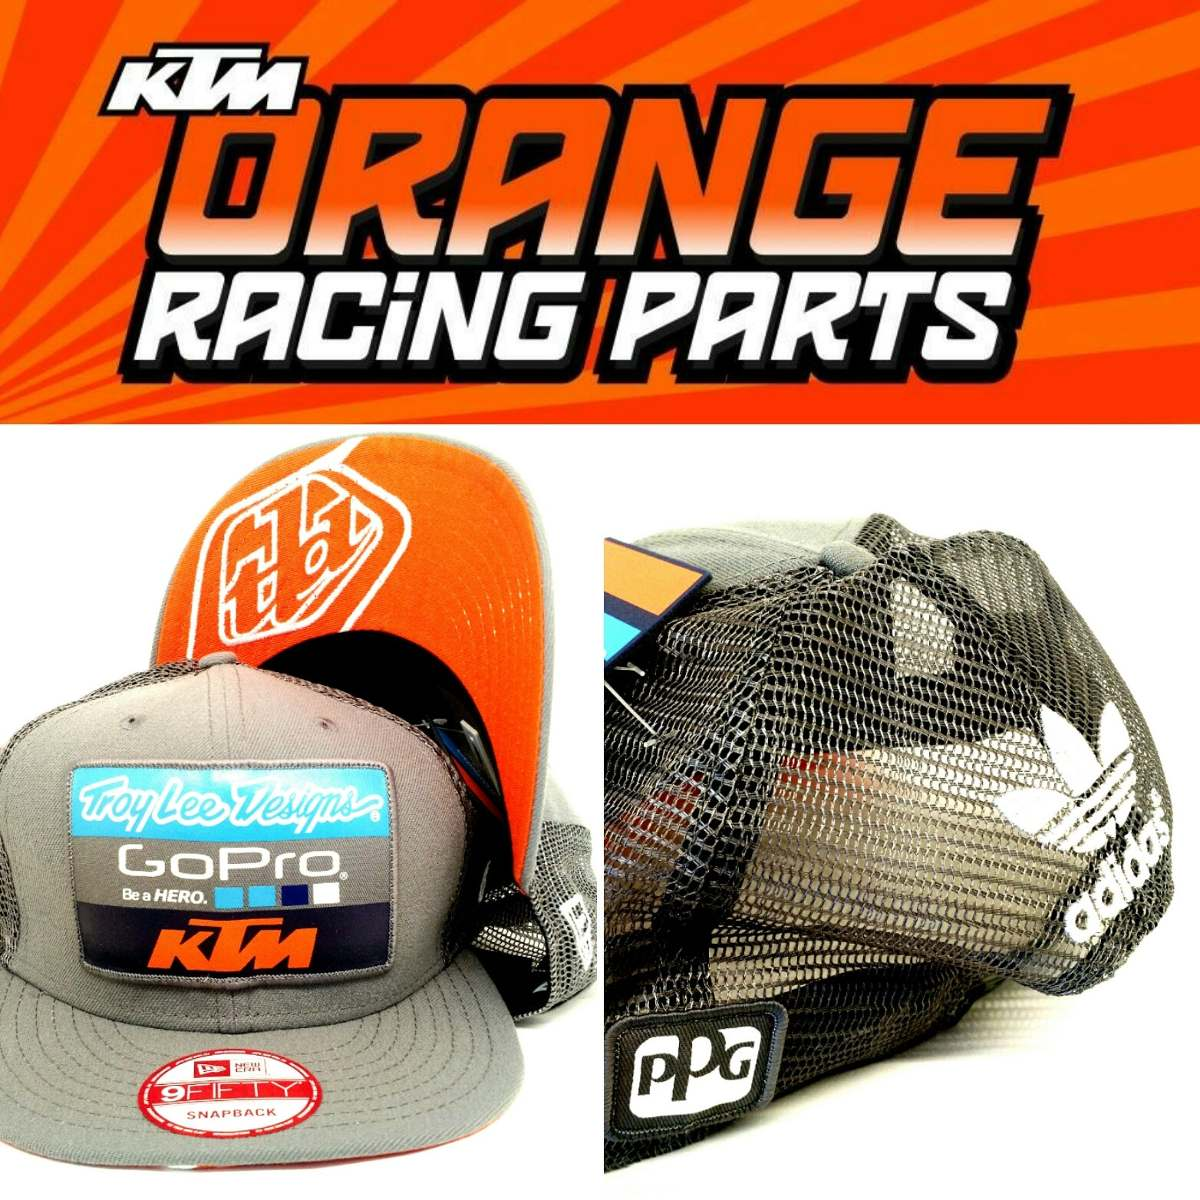 Gorra Troy Lee Design adidas Ktm Gopro!! Orange Racing Parts -   750 ... 88098bf422f